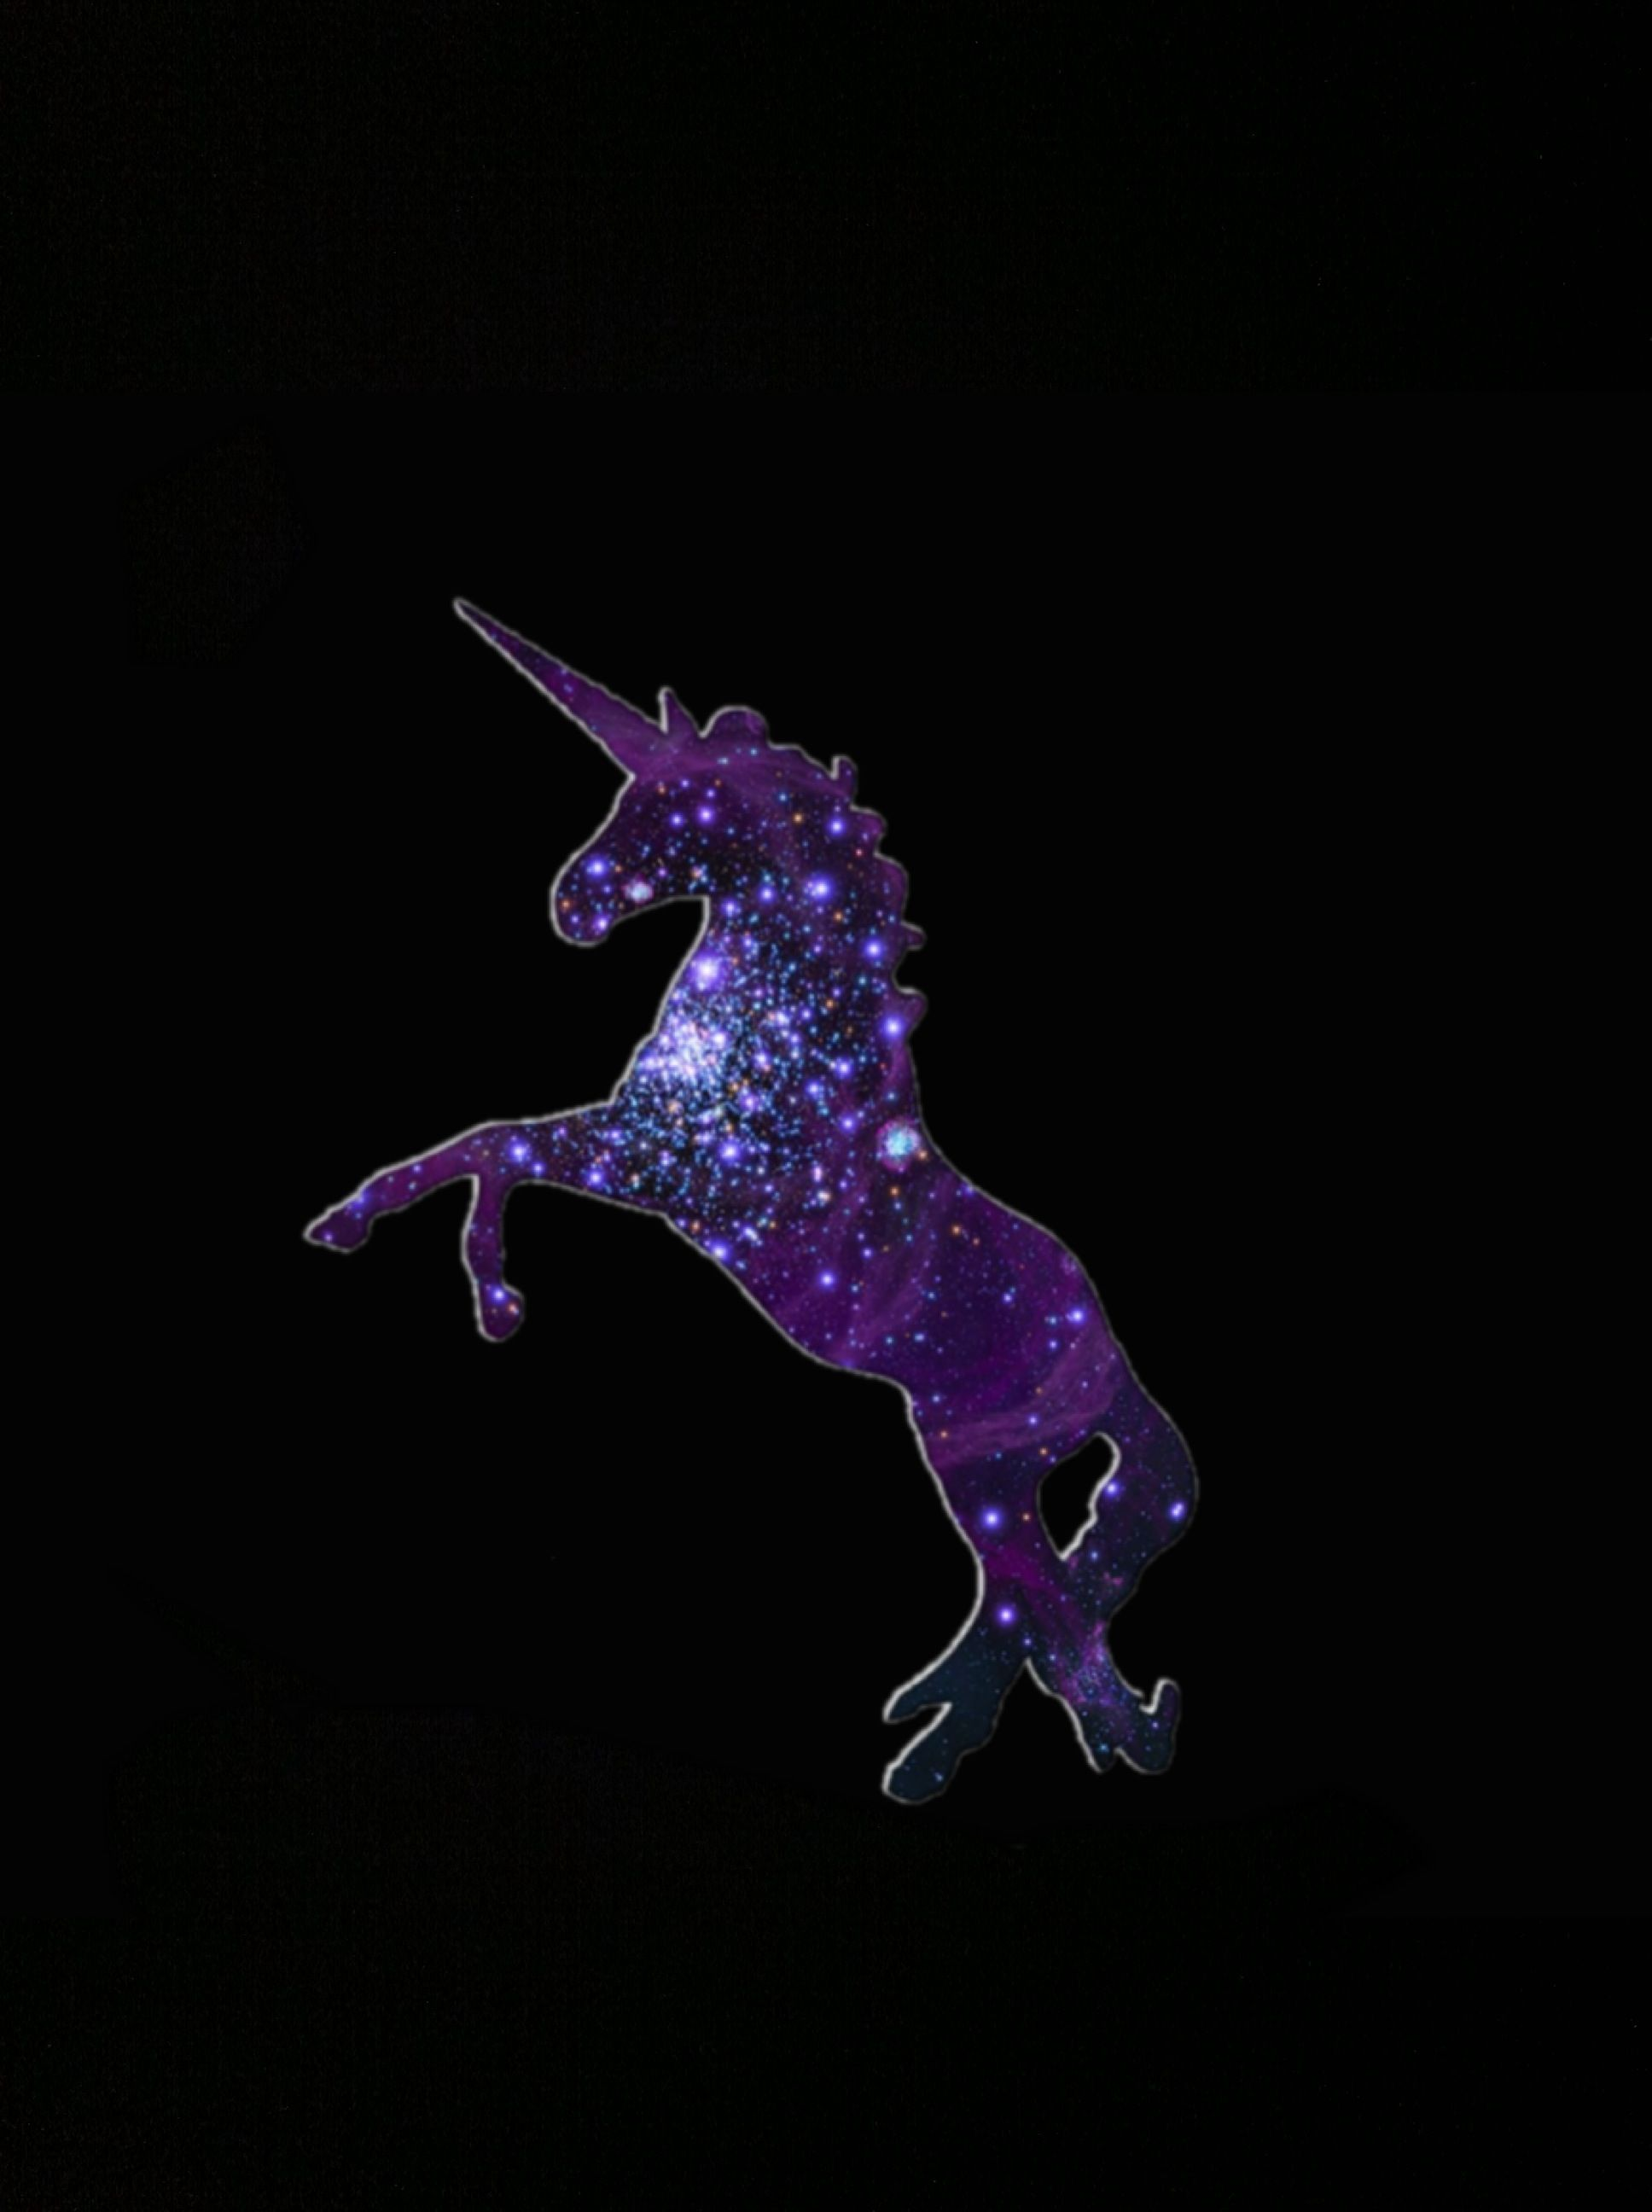 Wallpaper iphone unicorn tumblr - Wallpaper Iphone Unicorn Tumblr 14